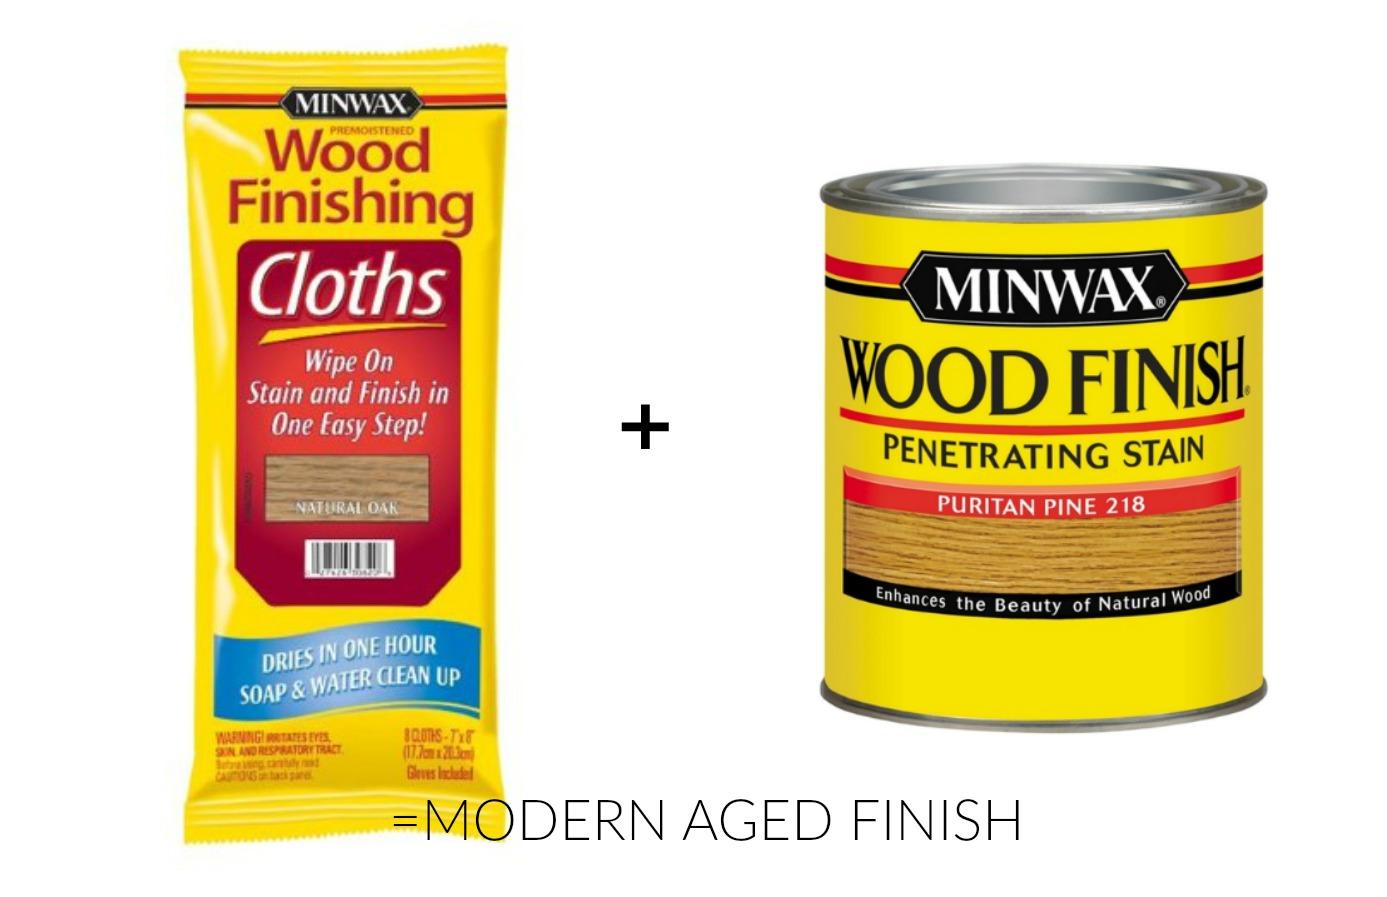 Modern-Finish-With-Minwax